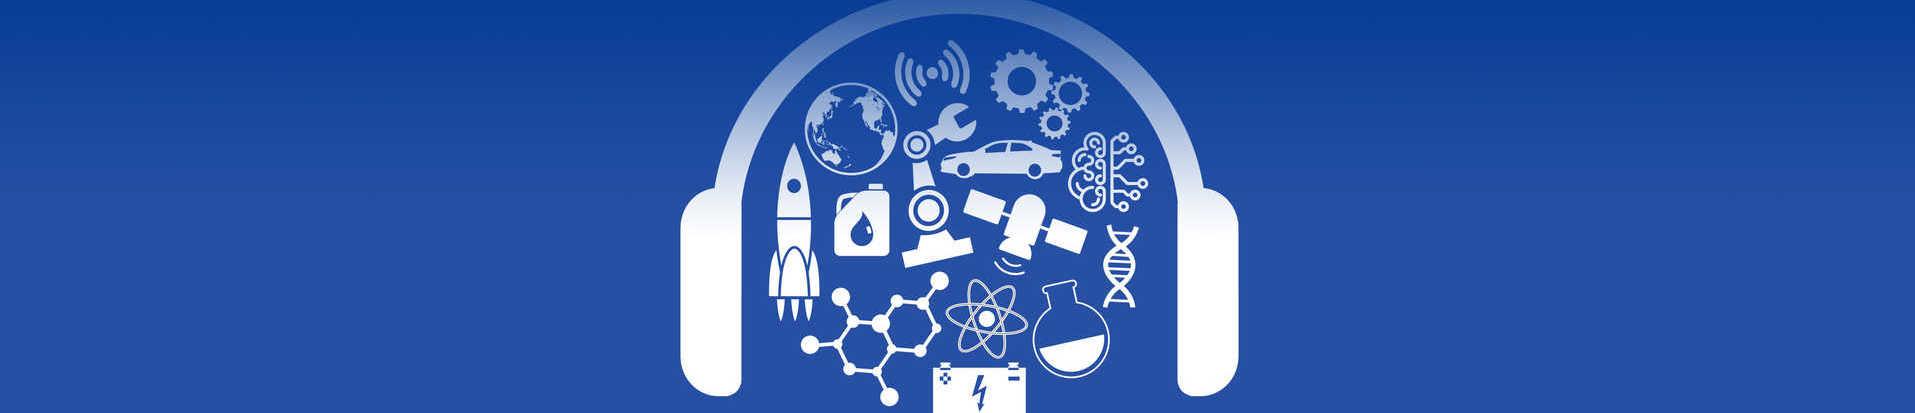 White Technology Today Podcast logo on a blue background